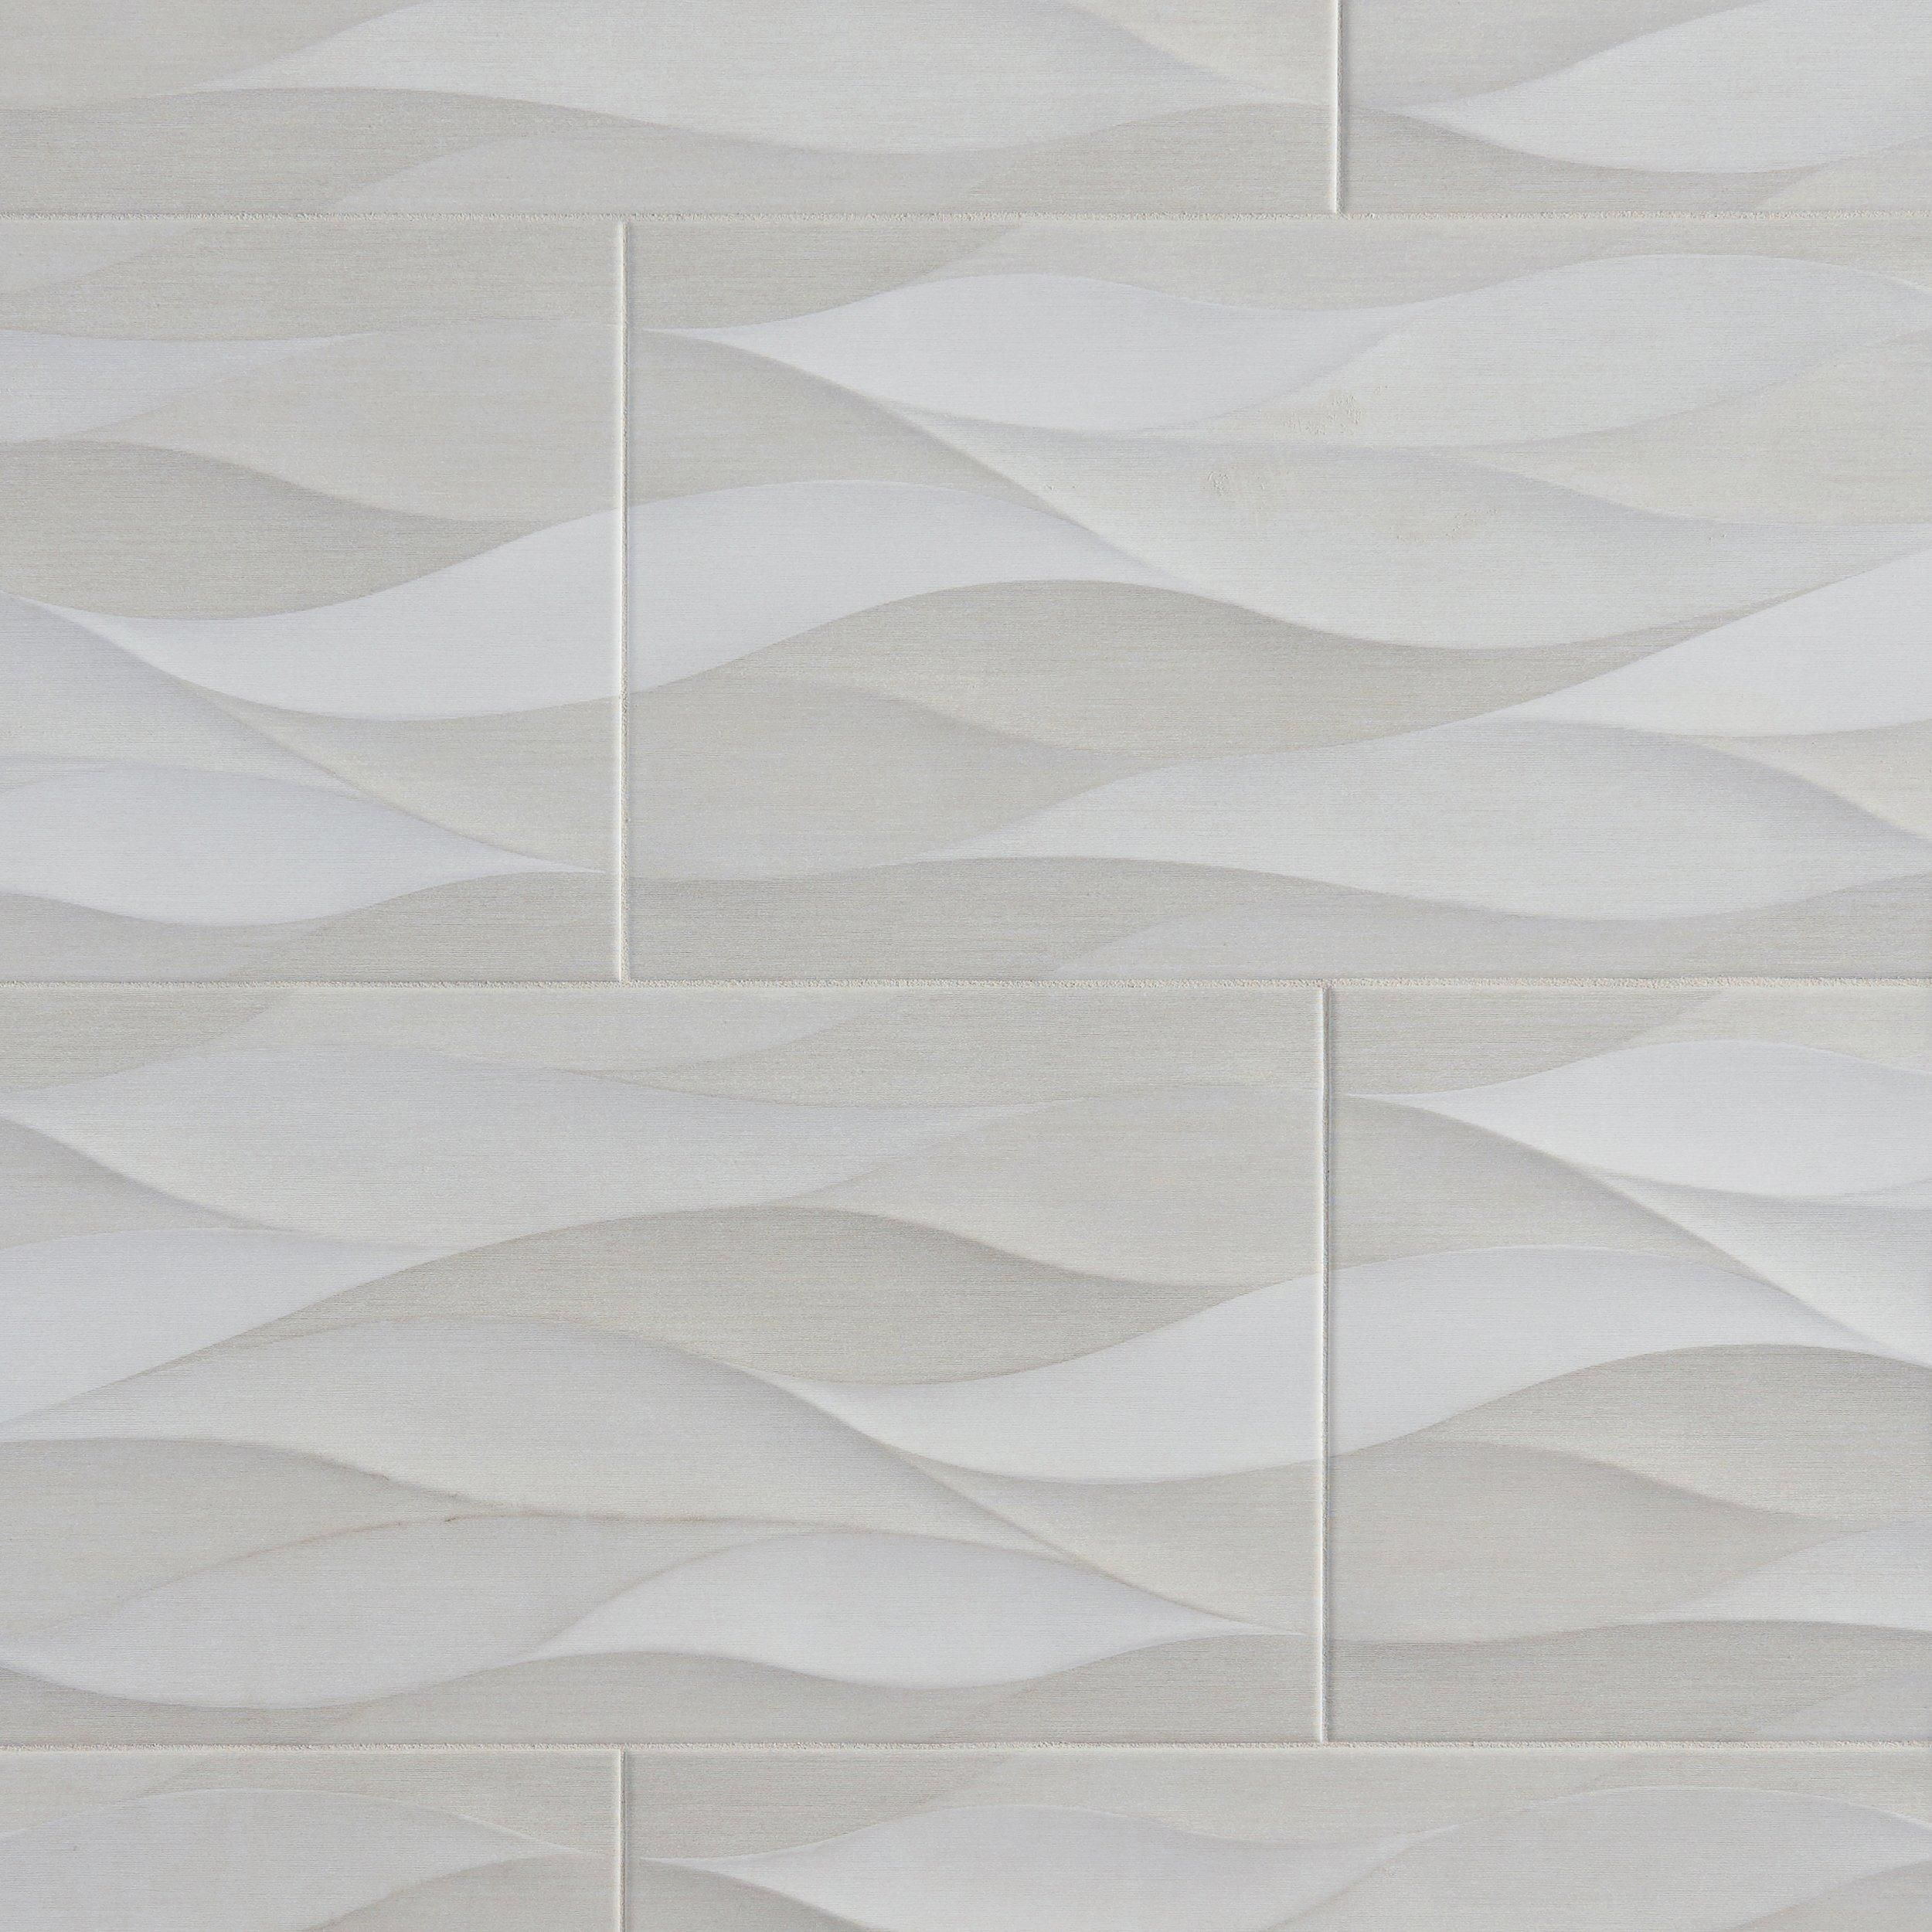 mirror subway wall tile for kitchen and bathroom mv-scott